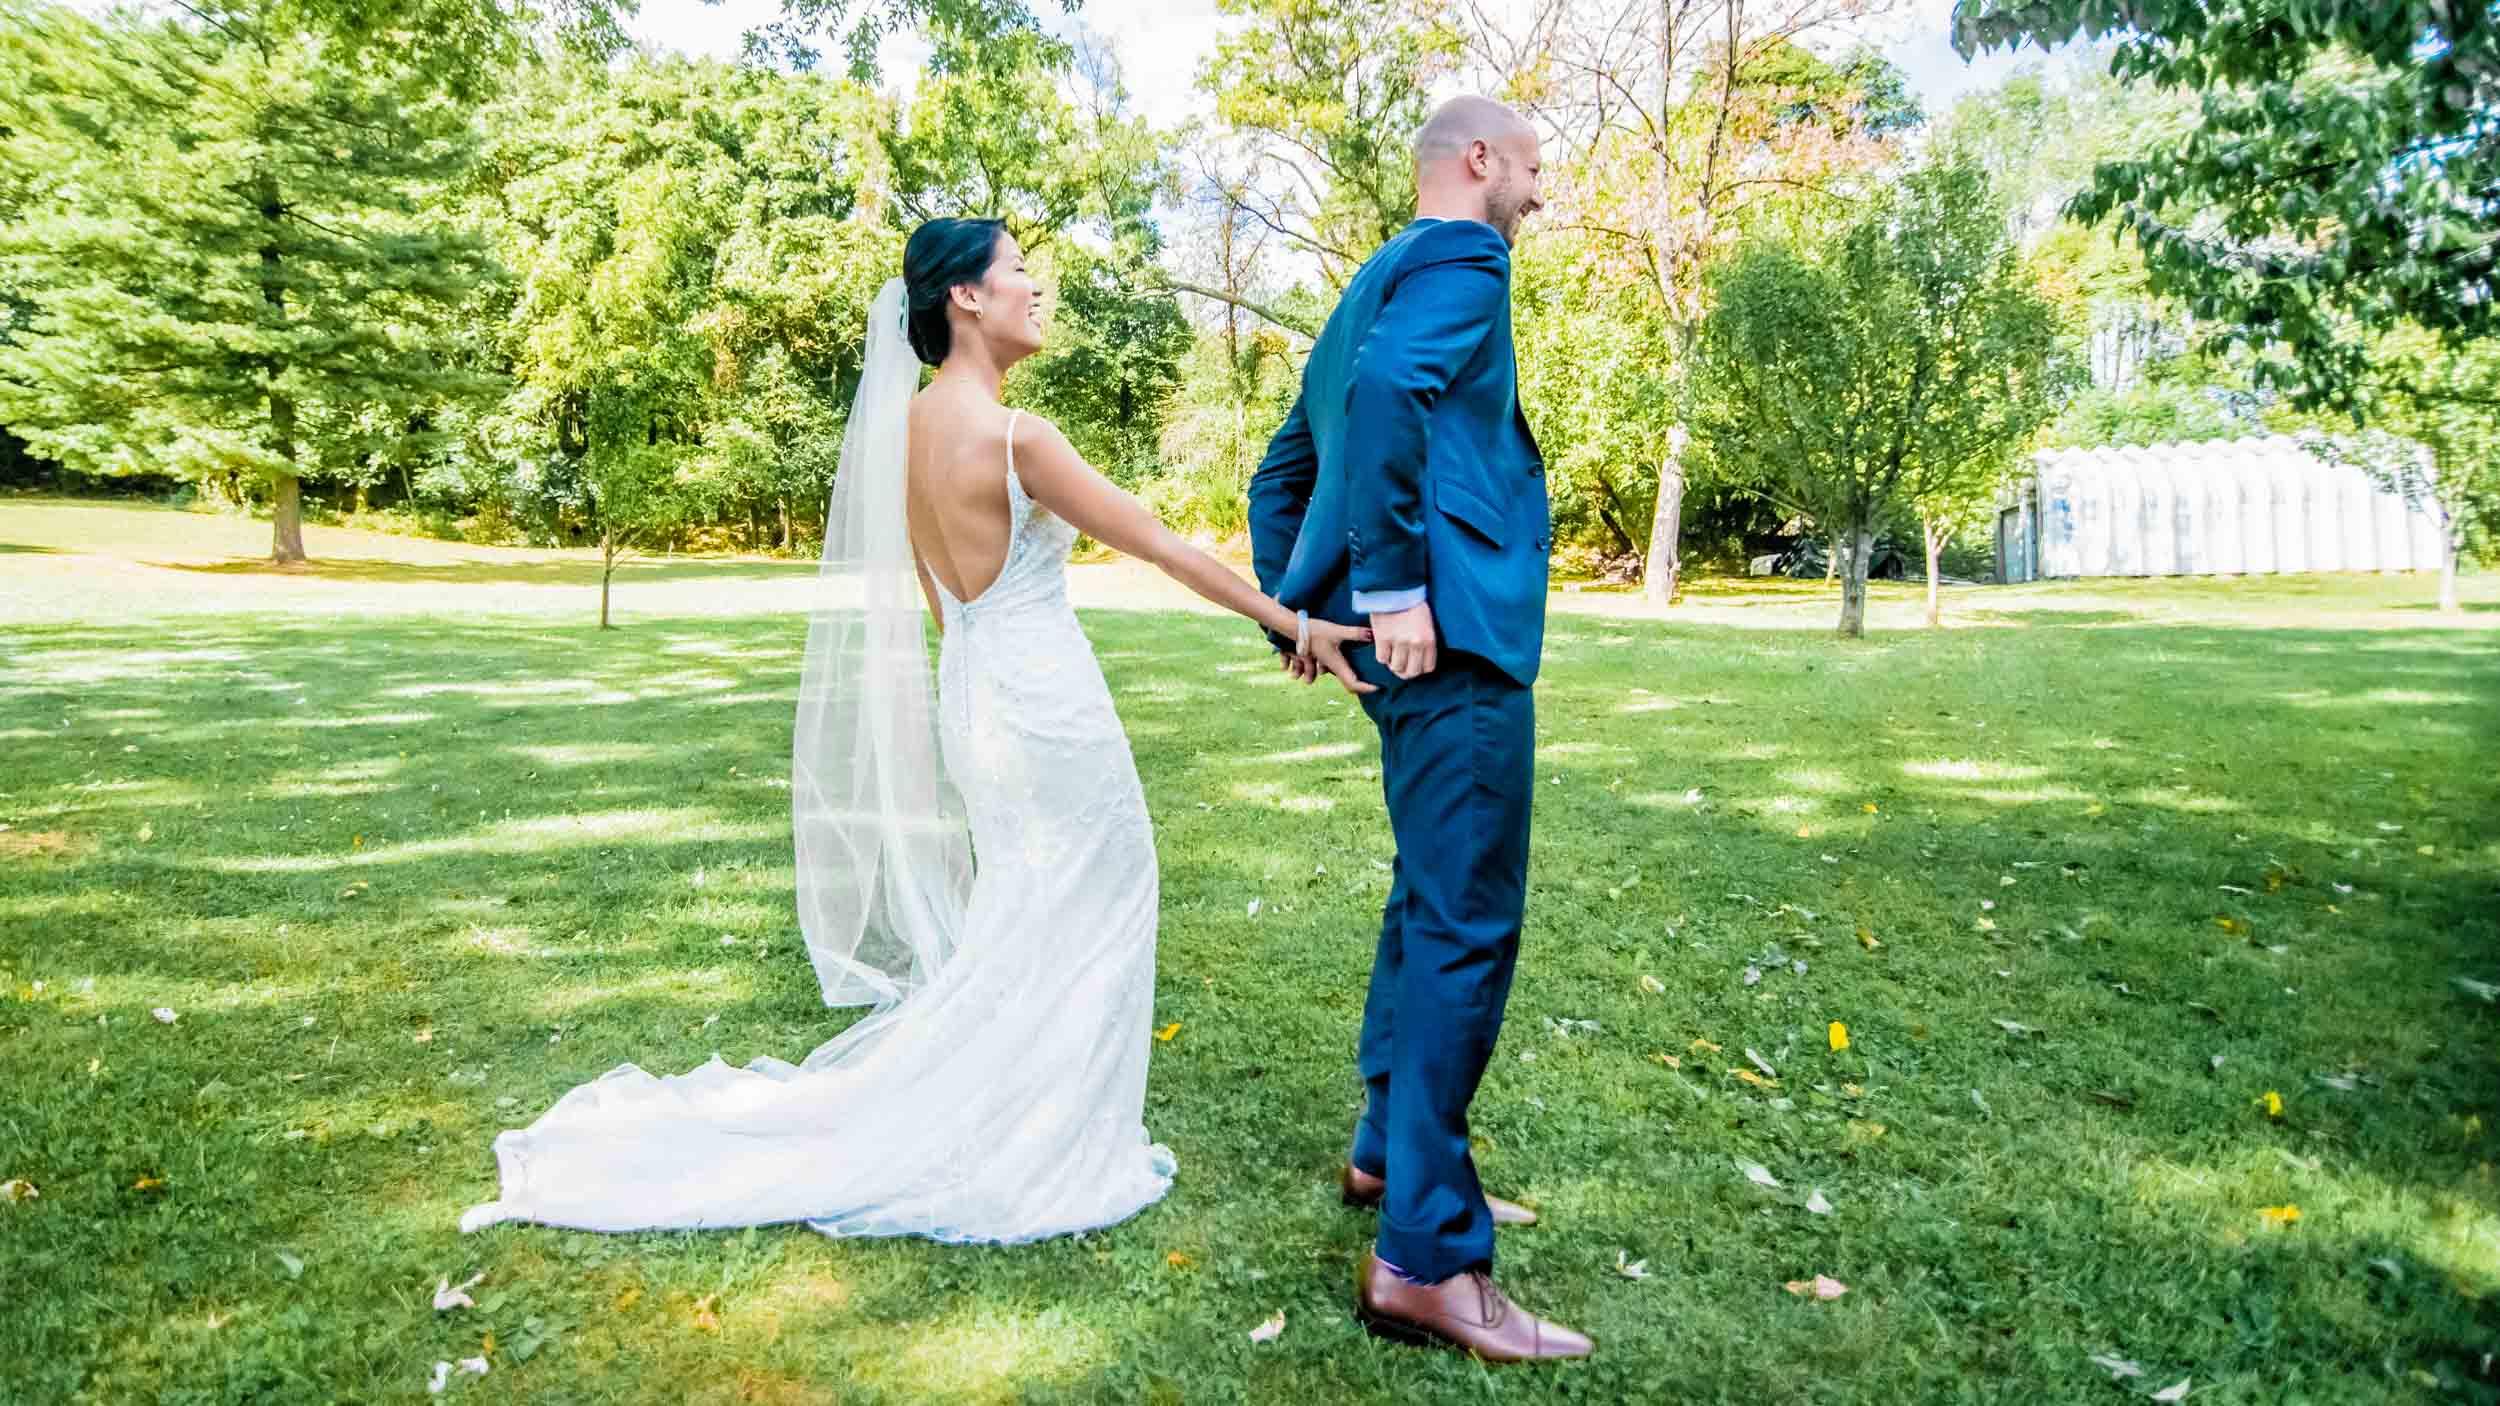 dc+metro+wedding+photographer+vadym+guliuk+photography+weddings+first-look-2026.jpg